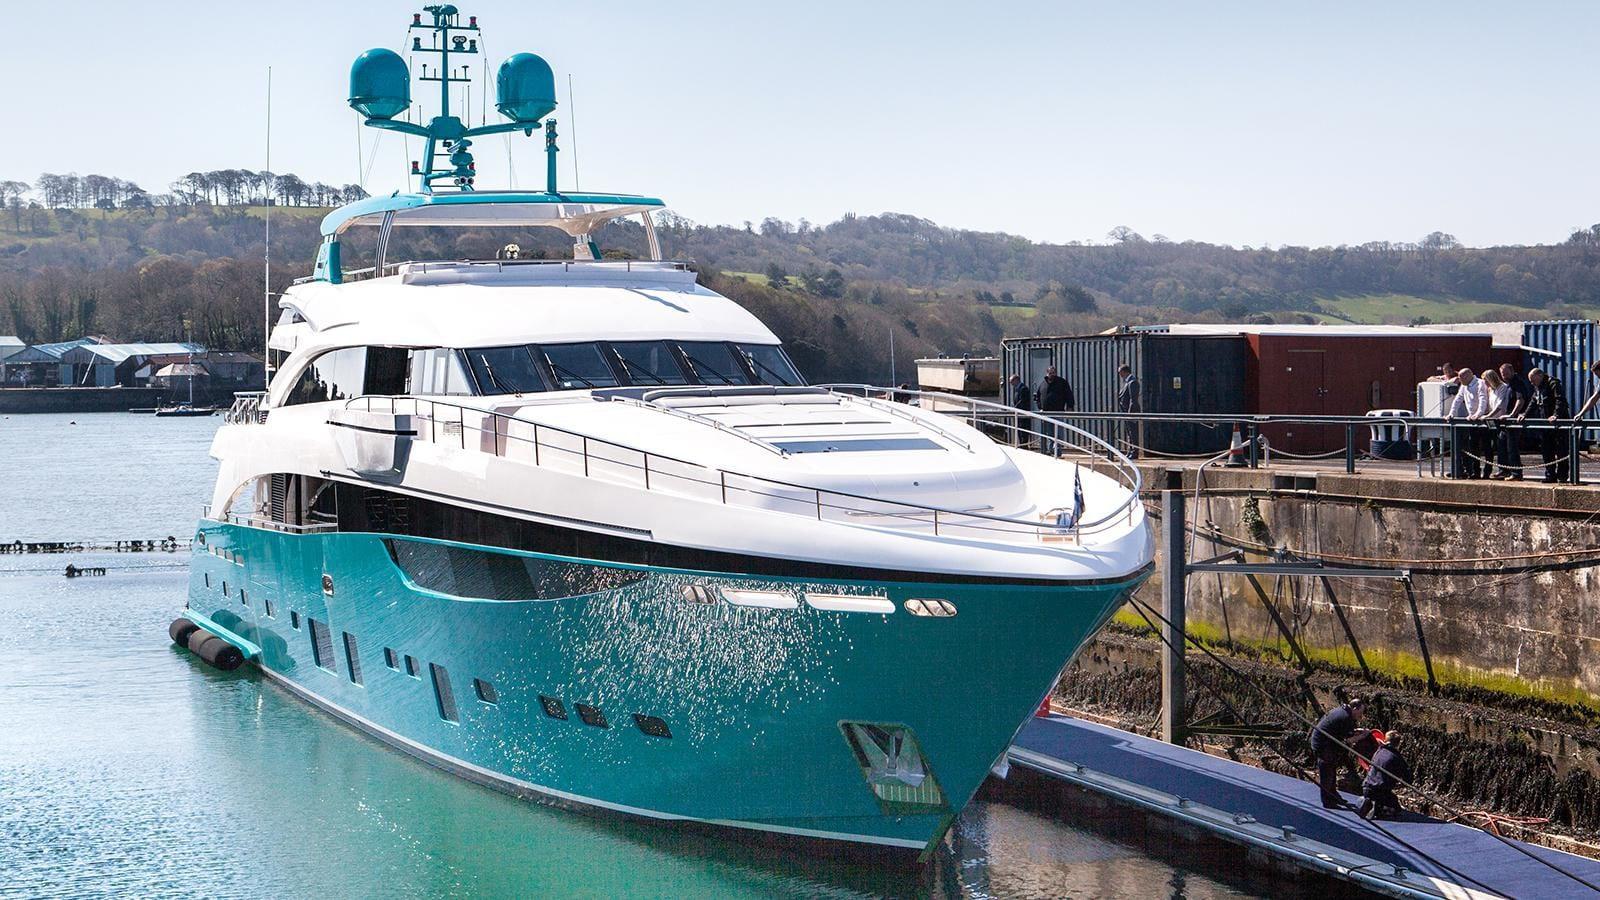 Роскошная чартерная супер яхта Princess 40M Anka